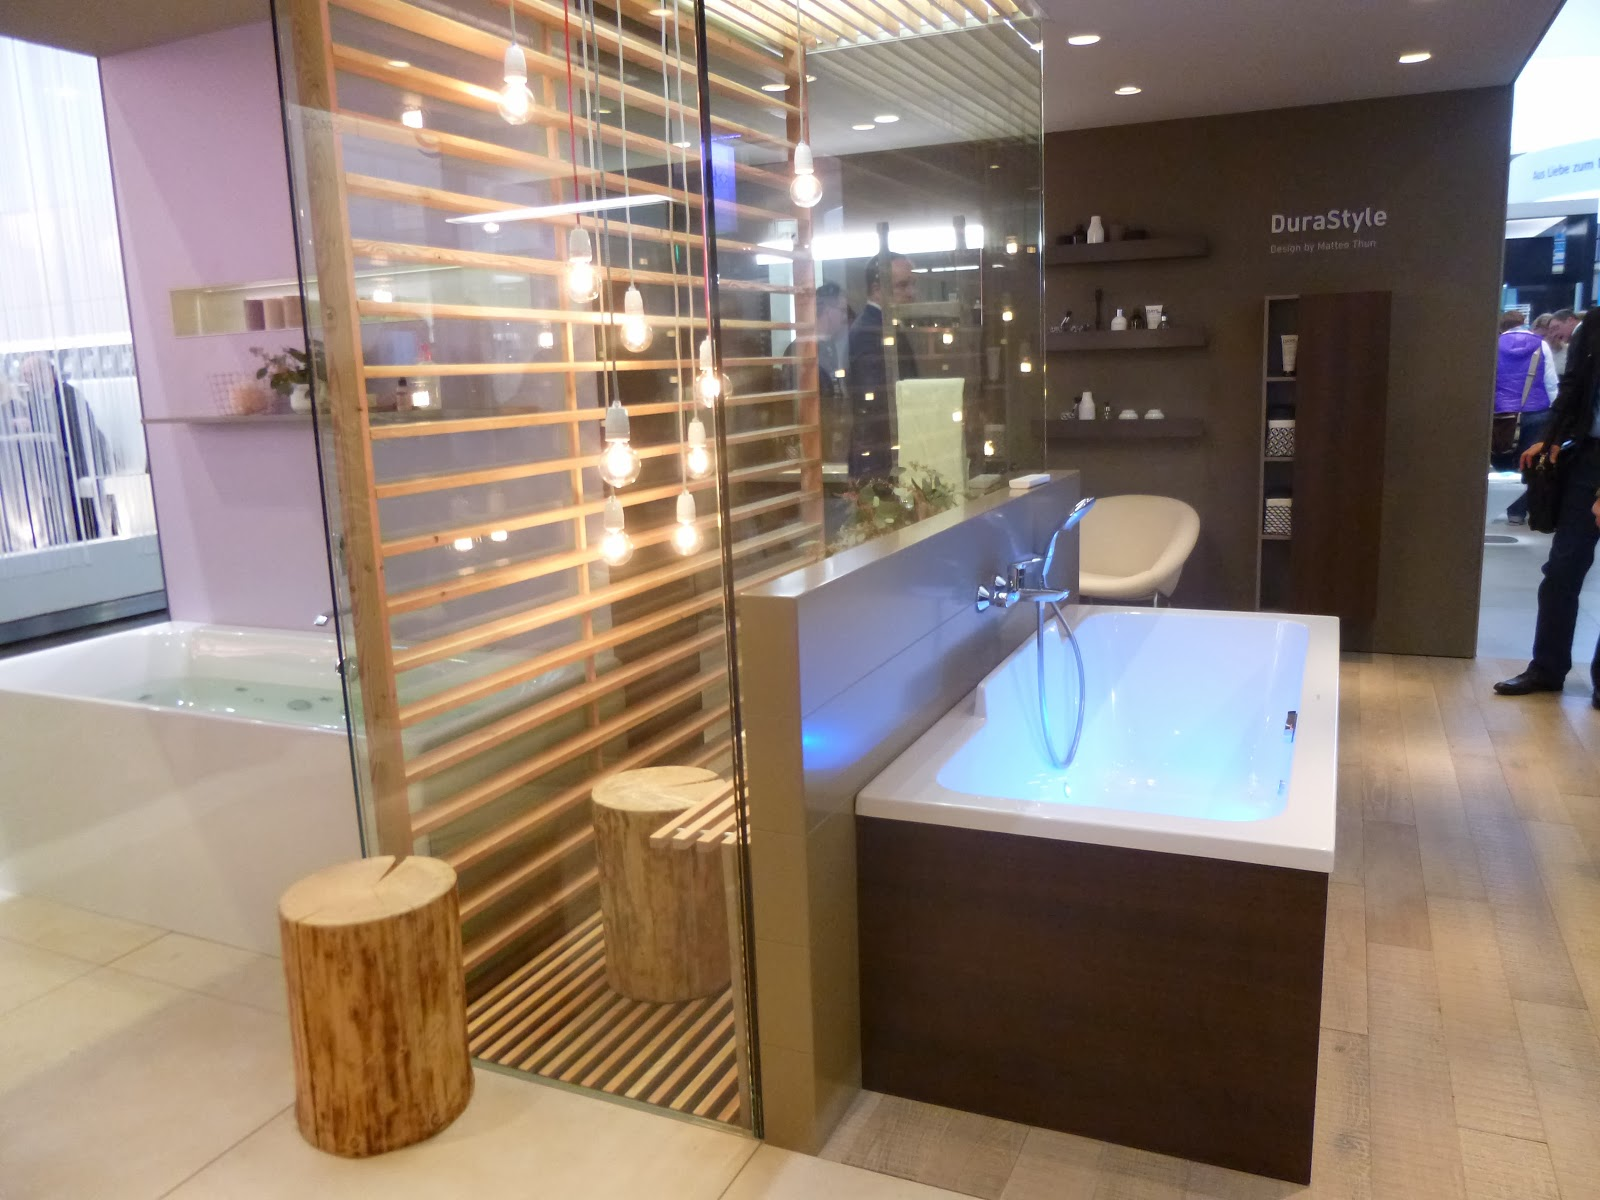 Konzept Interior-Design Lifestyle Private Spa: 2014-03-09